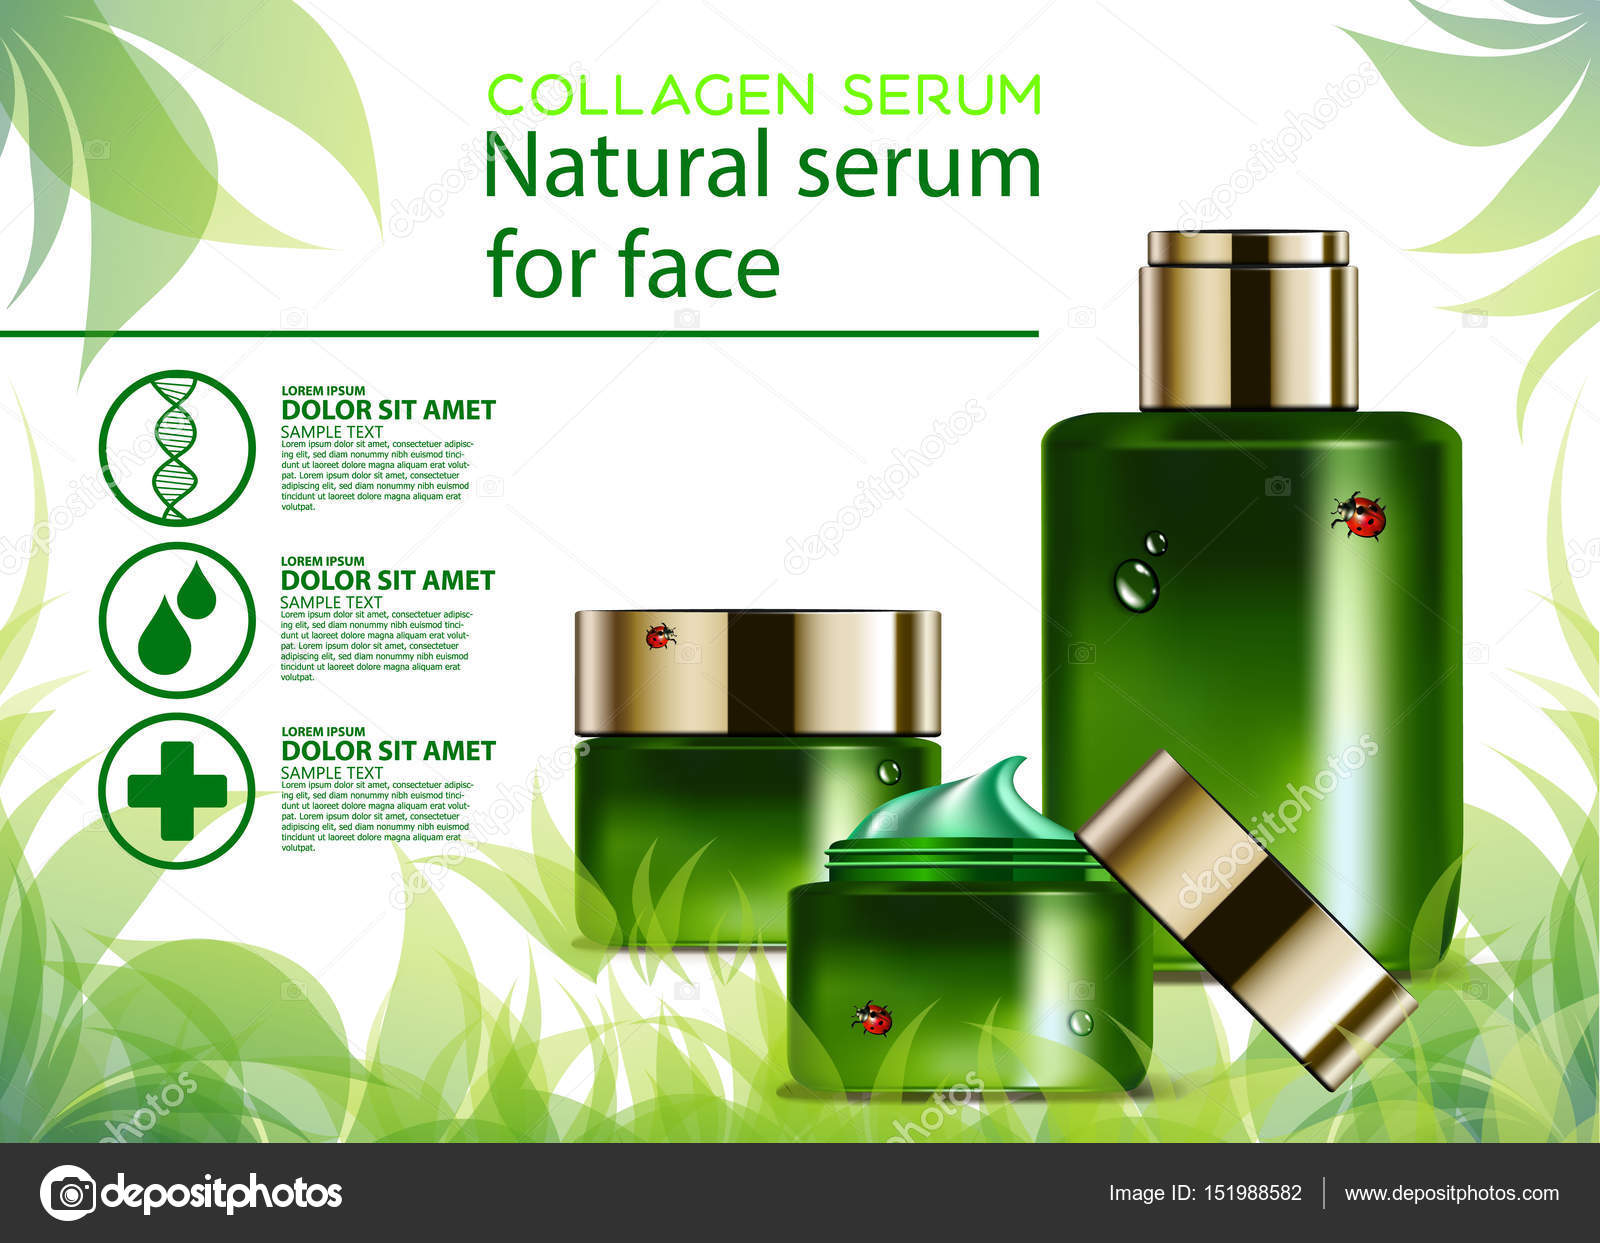 Collagen Beauty Natural Skincare Design Skin Cosmetic Stock Photo C Dasha Kovtun55555 Gmail Com 151988582